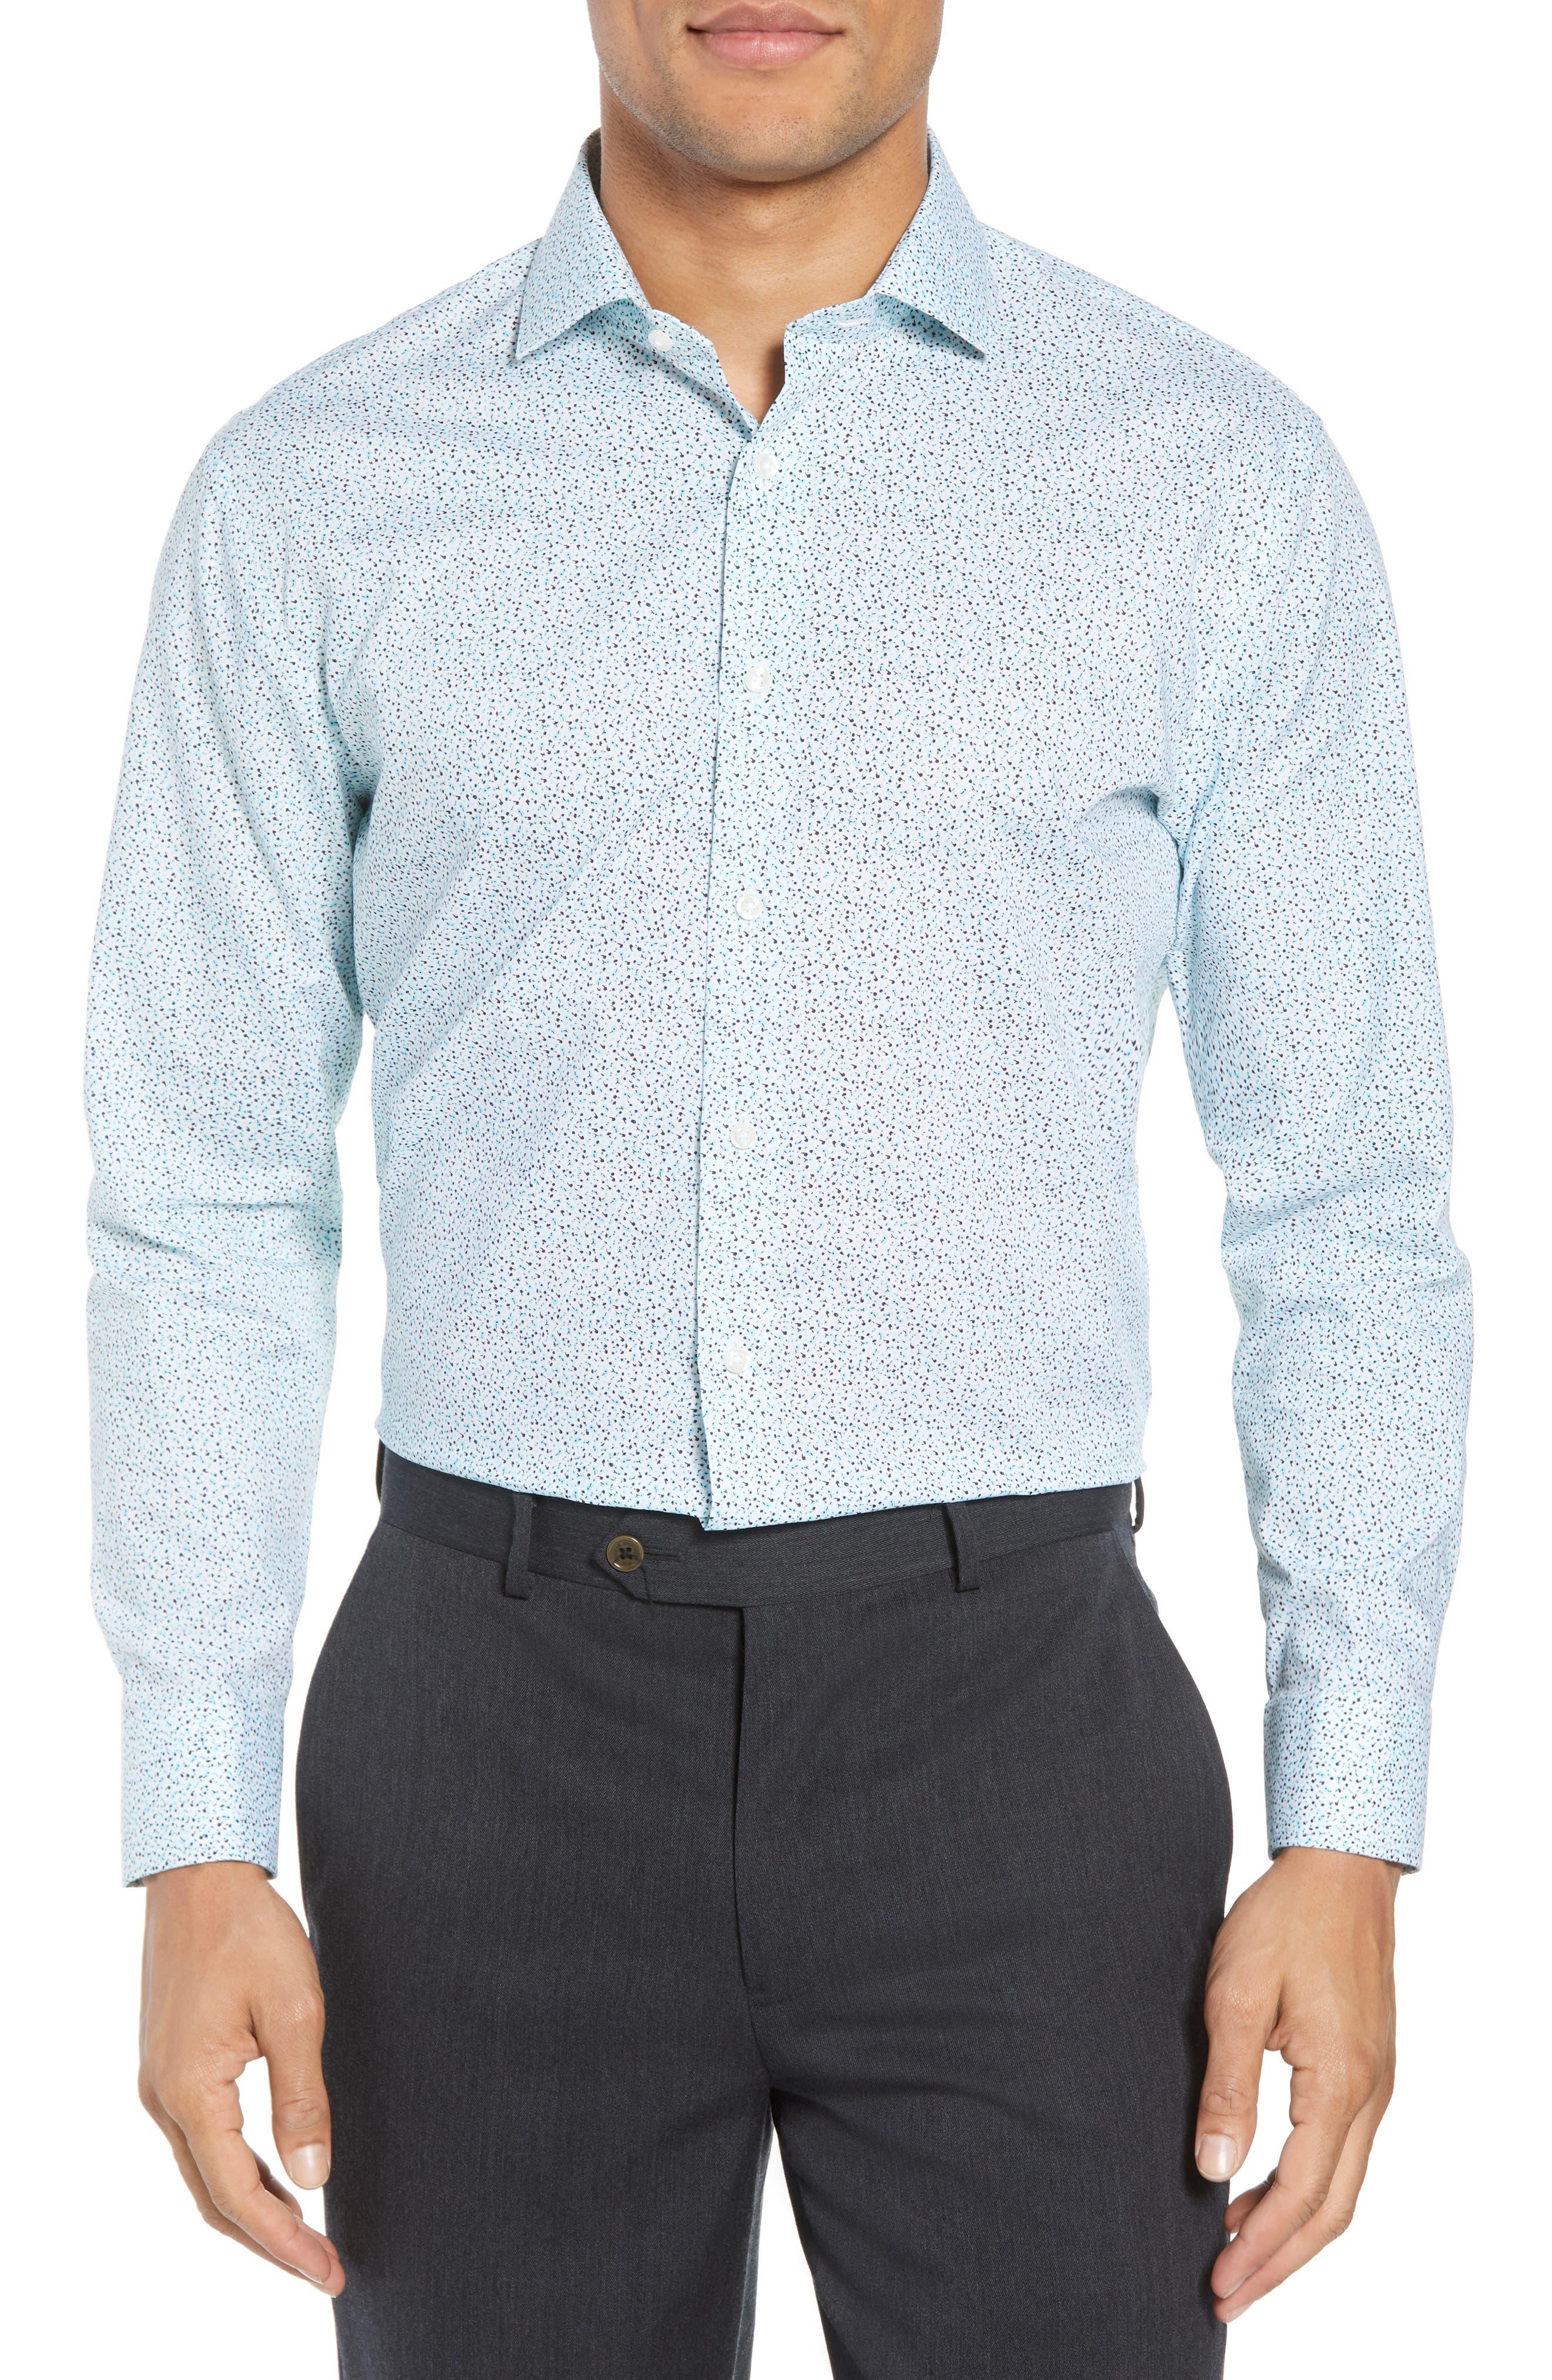 Nordstrom Men's Shop Trim Fit Floral Dress Shirt